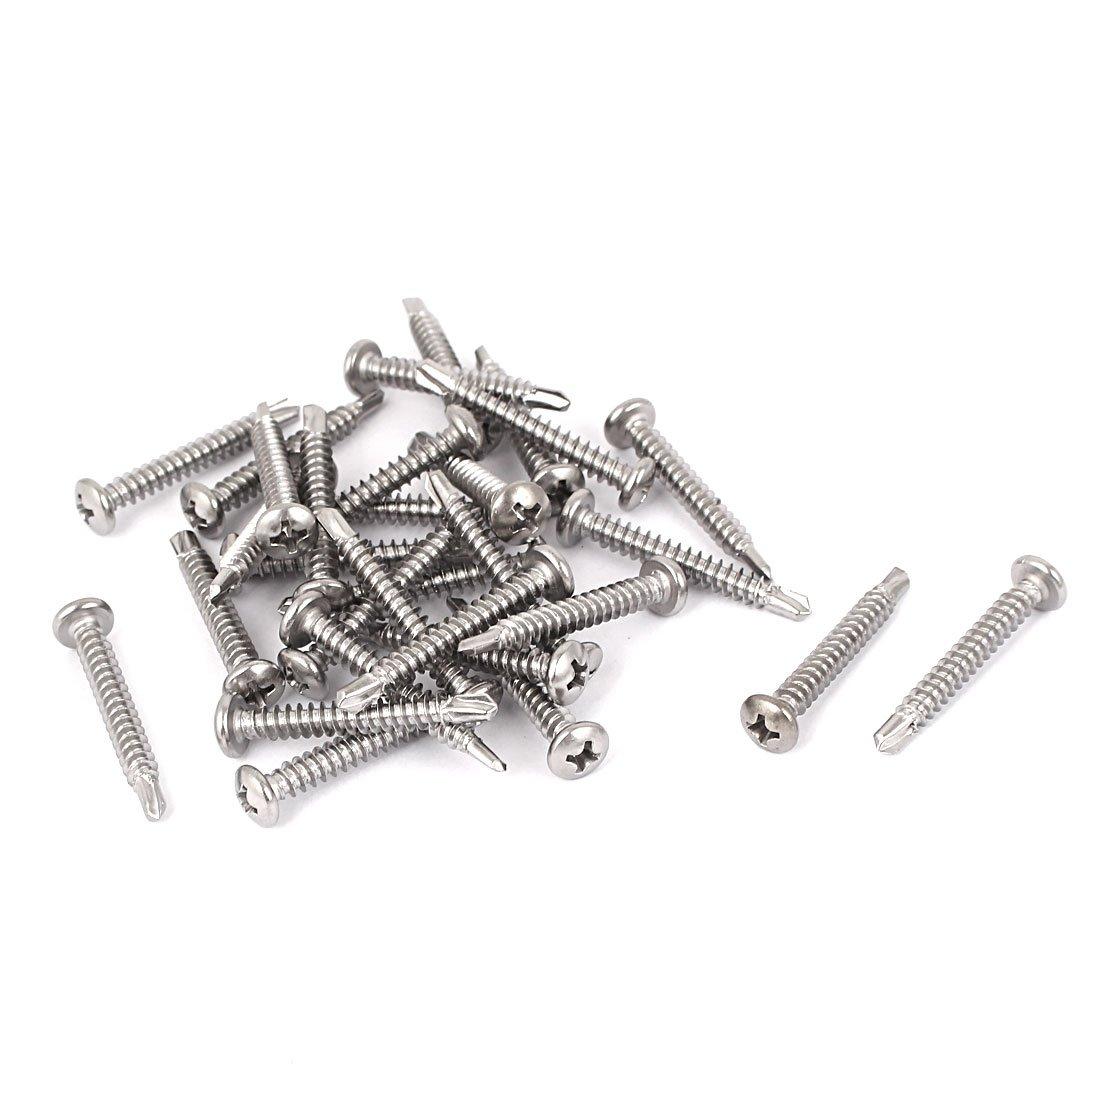 Cortador de fresa extralargo de 3 mm con 3 flautas HSS y punta de aluminio CNC extendida Besttse